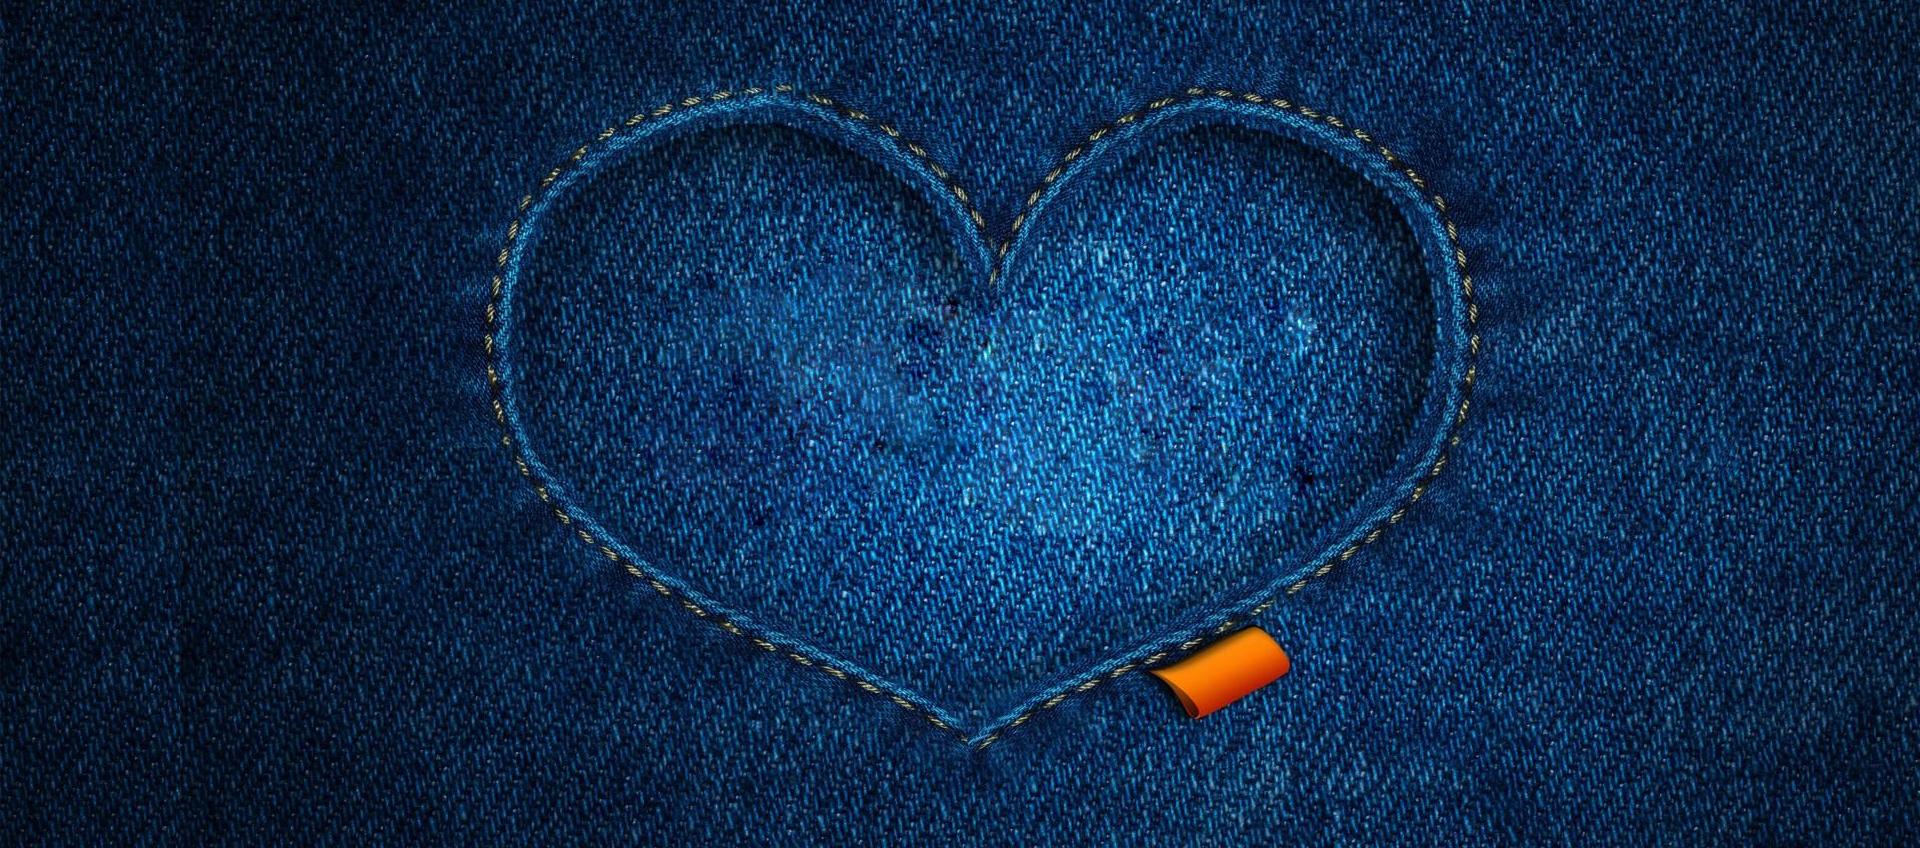 cal u00e7as de ganga azul o amor cora u00e7 u00e3o background textura